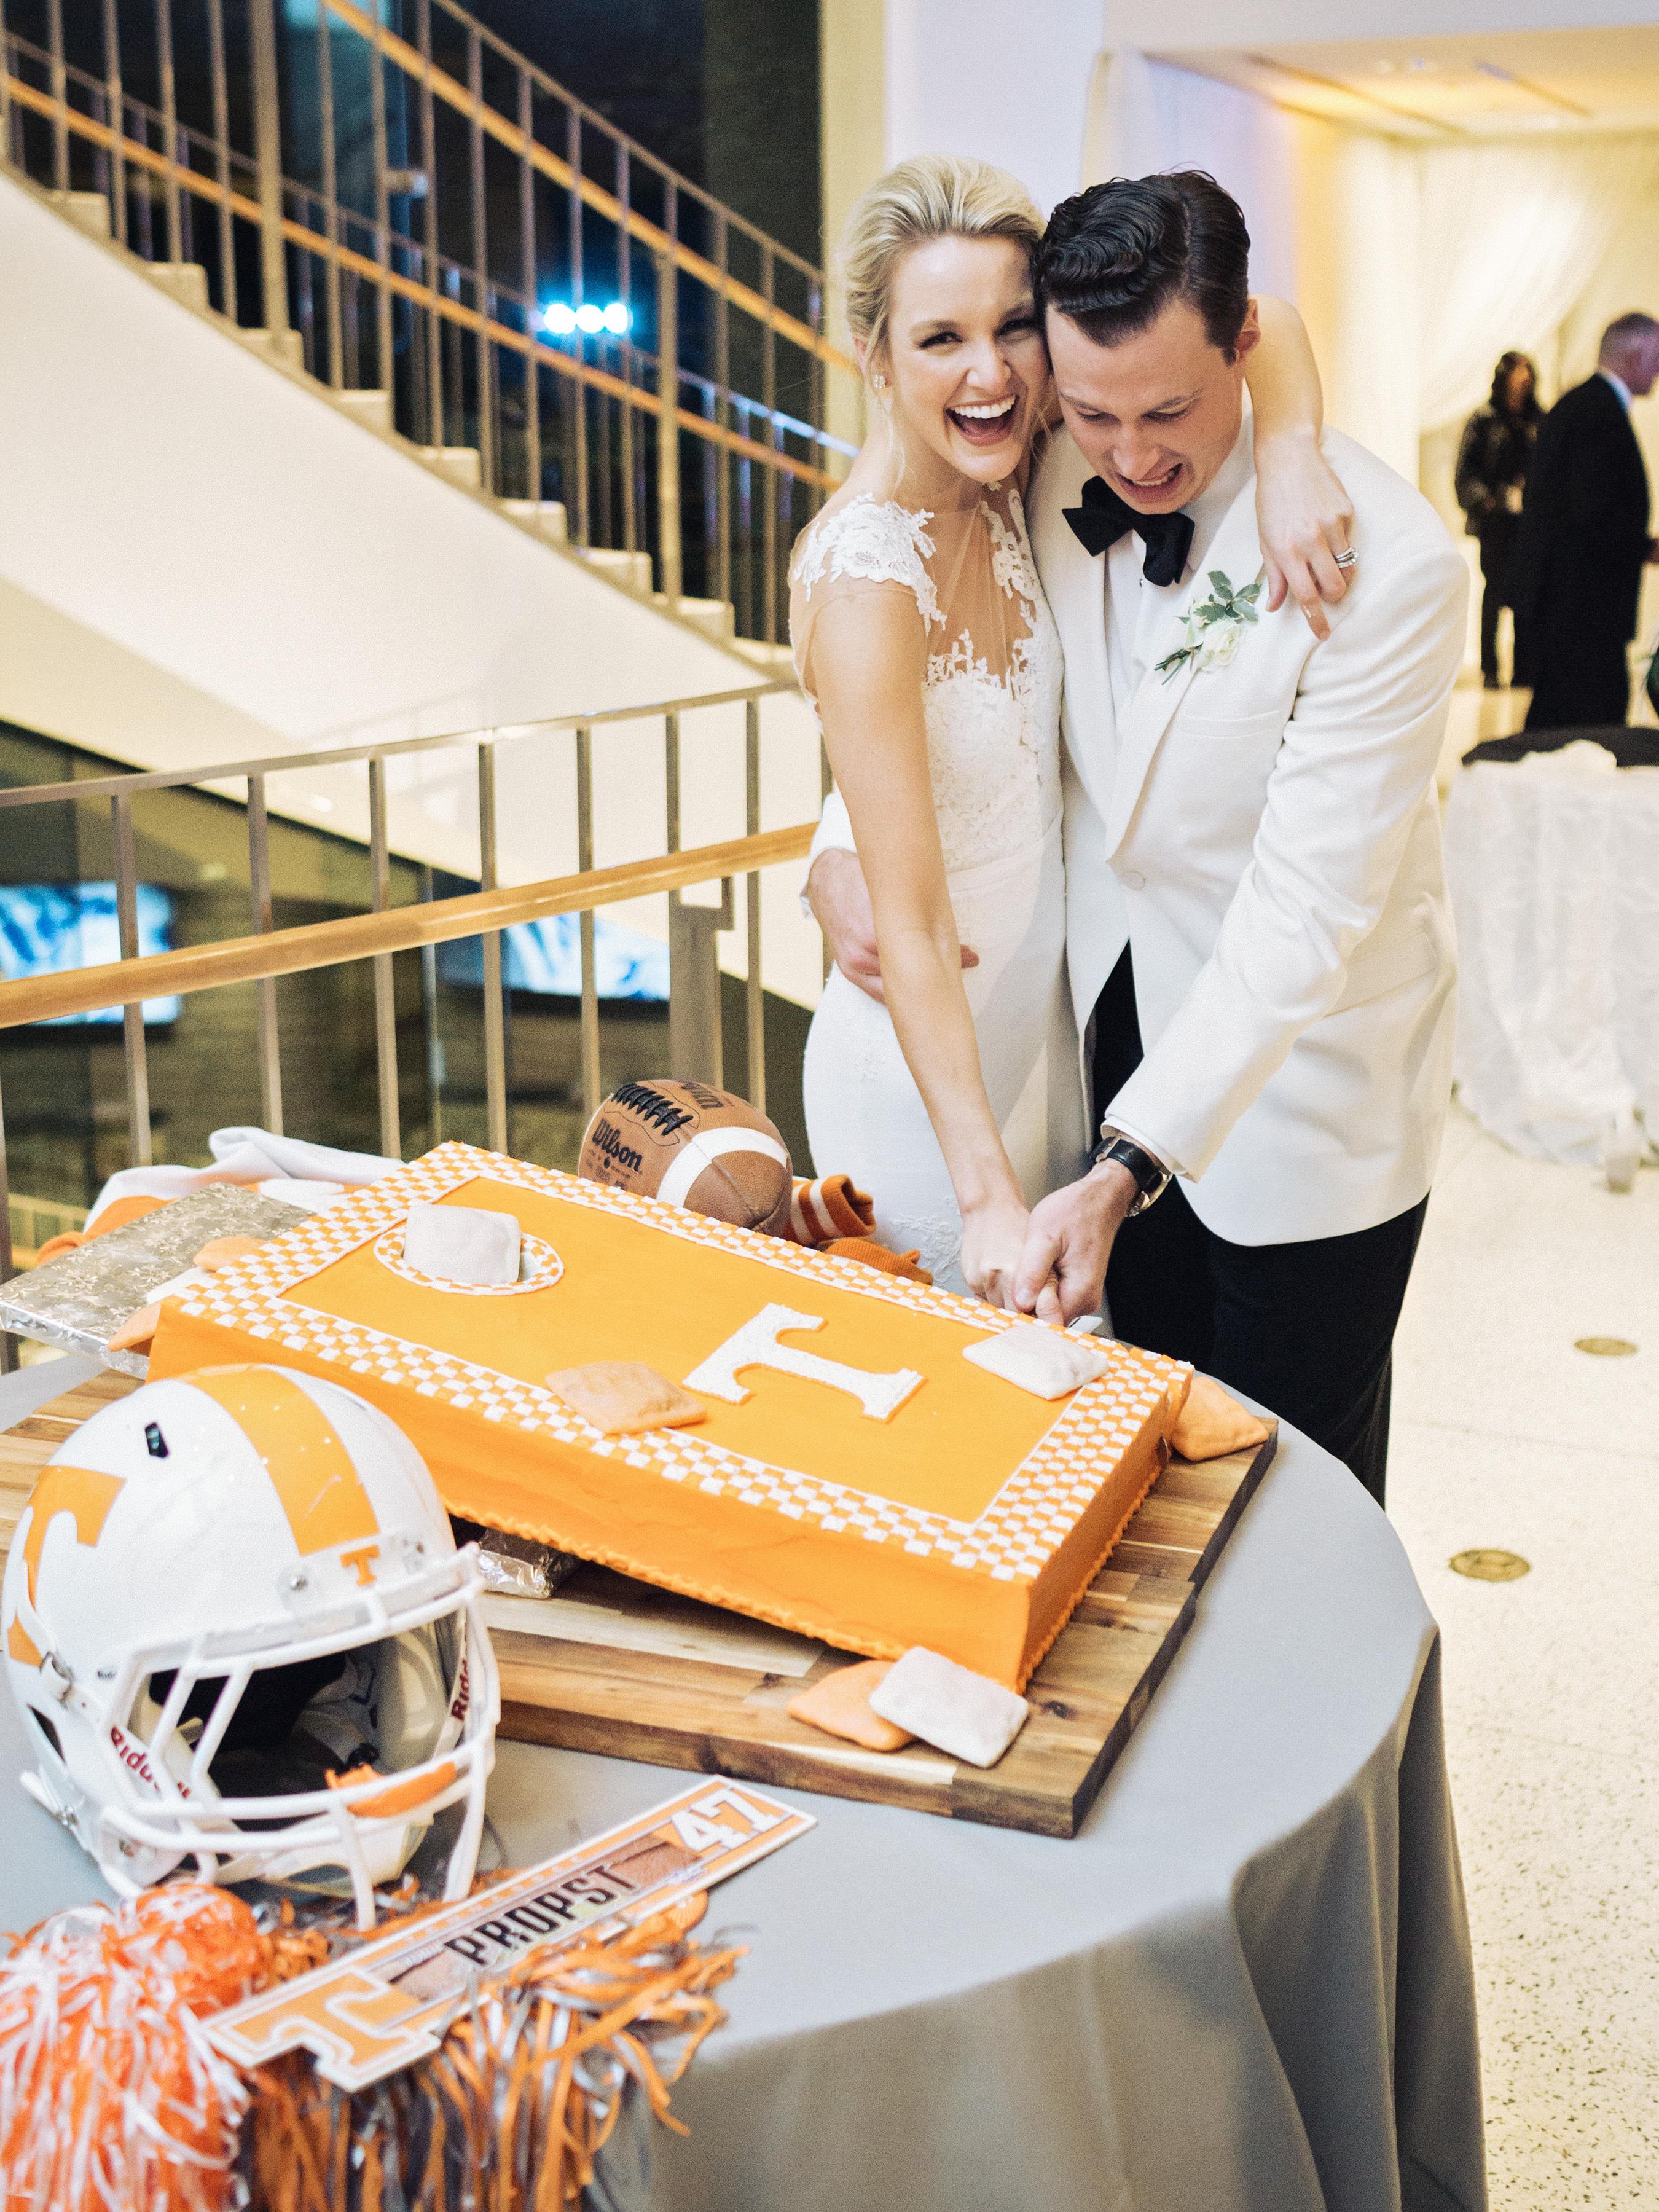 0533 Anna & John: A Clean and Modern Wedding at the Birmingham Museum of Art Uncategorized    invision_events, birmingham_al, auburn_al, alabama, atlanta_ga, atl, georgia, wedding_planner, wedding_designer, weddings, photography, wedding_planning